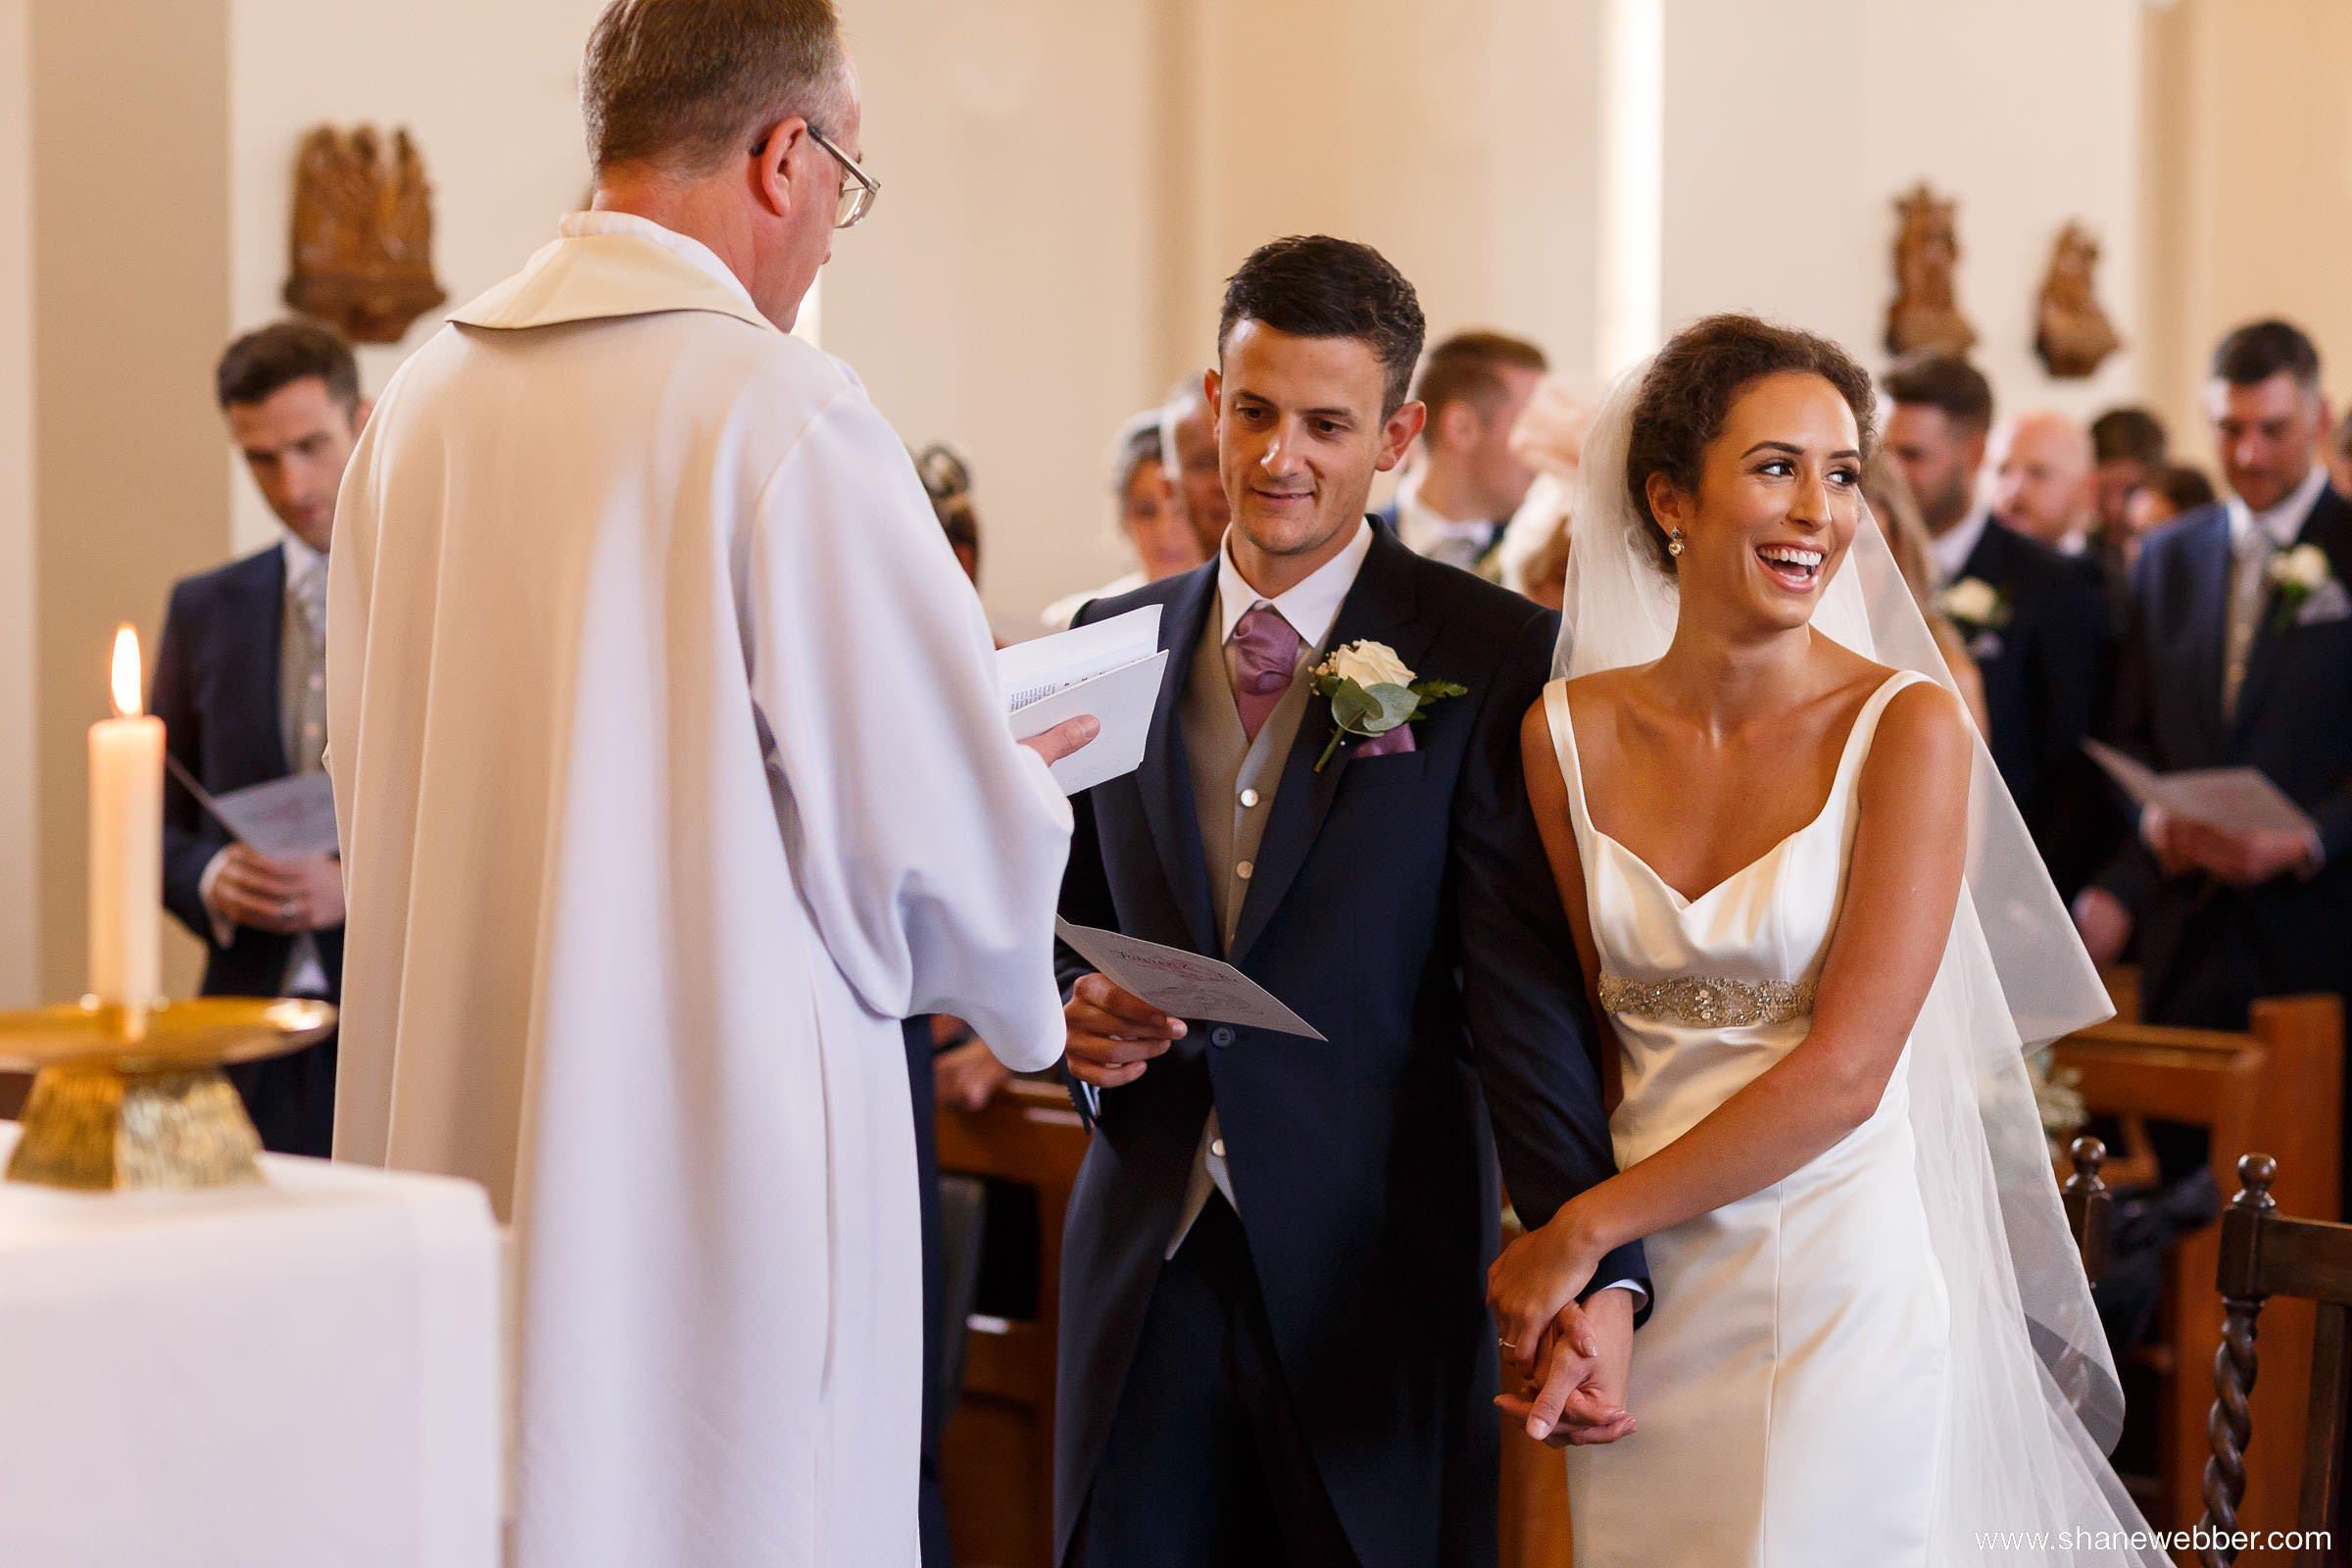 giggles during wedding photos